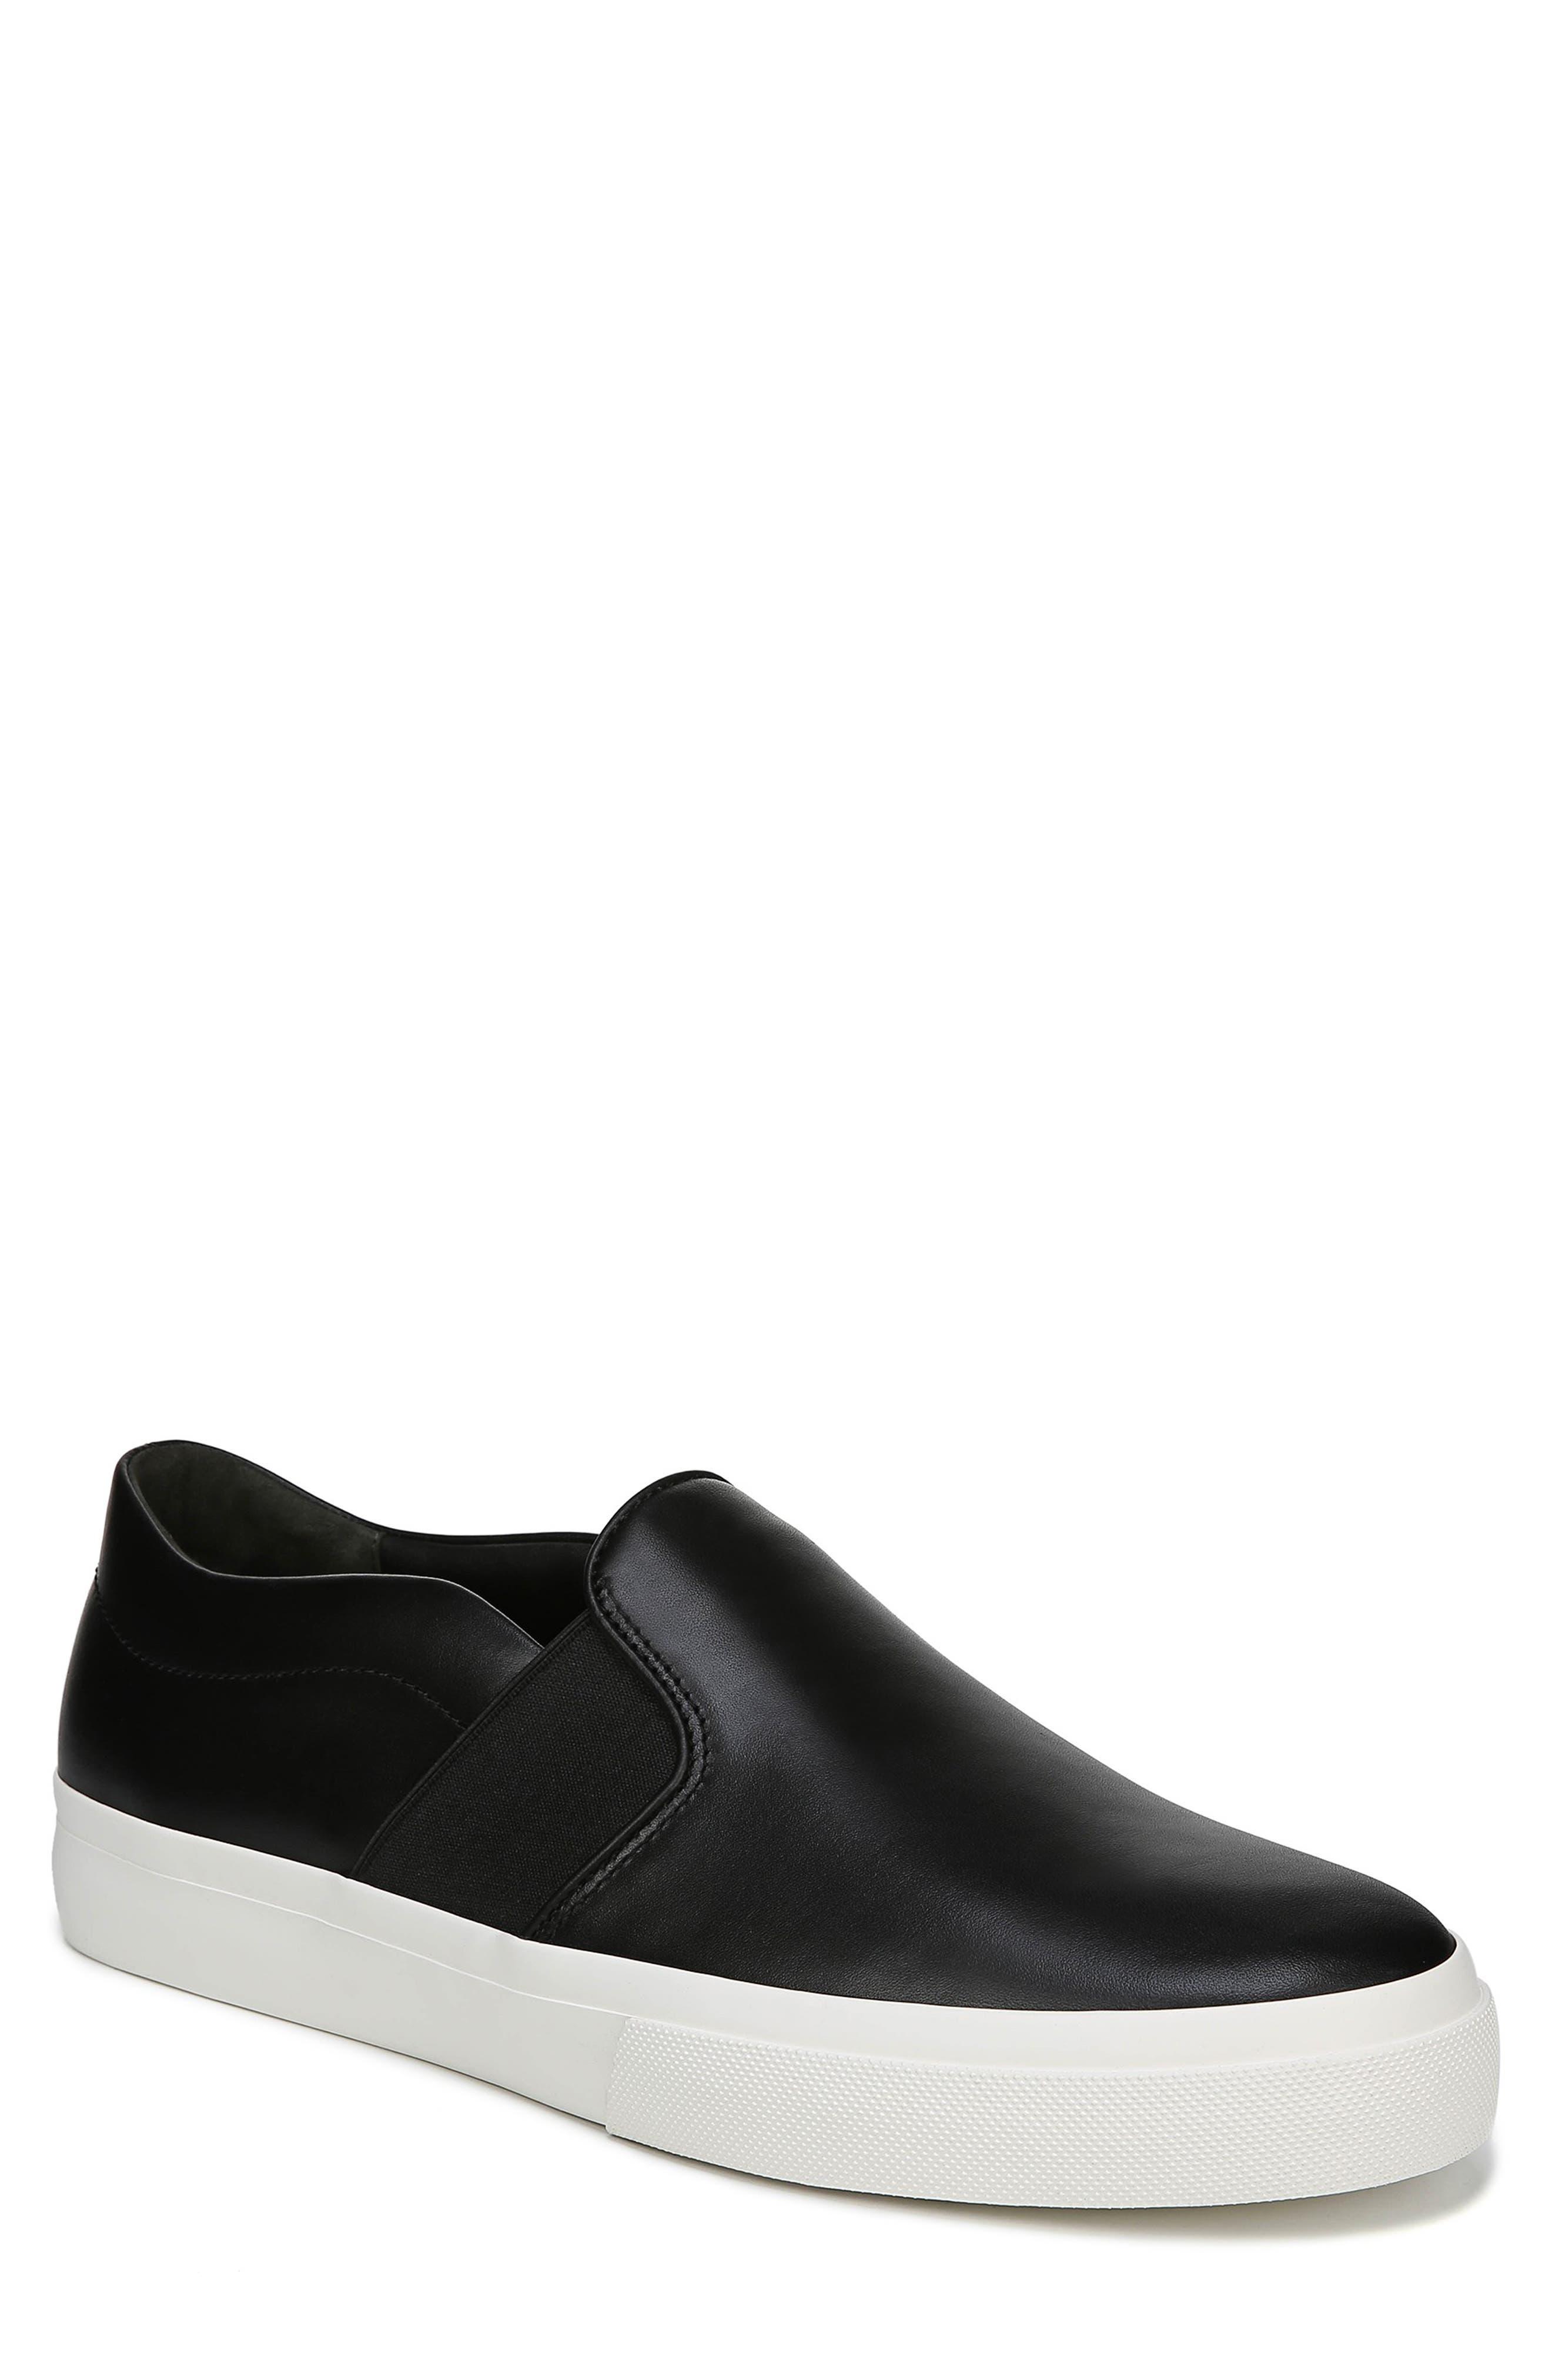 Fenton Slip-On  Sneaker,                             Main thumbnail 1, color,                             BLACK/ BLACK